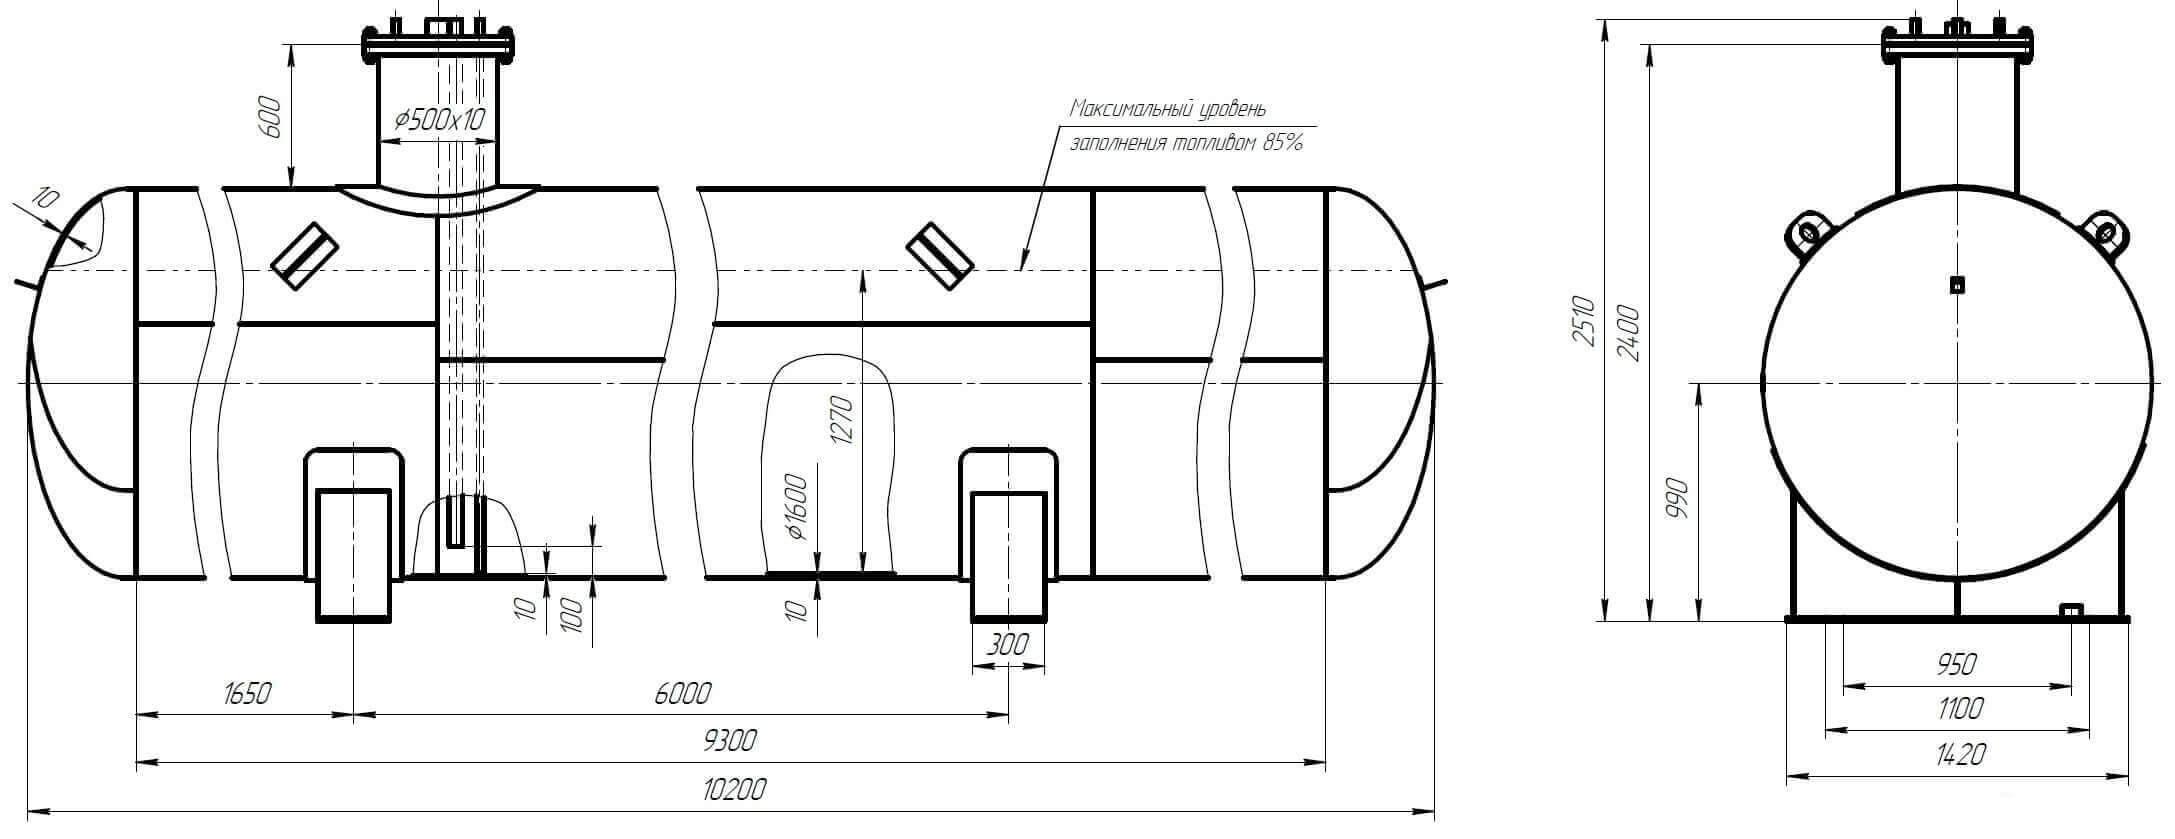 rezervuary i emkosti stekloplastik 9 Резервуары и емкости (стеклопластик)